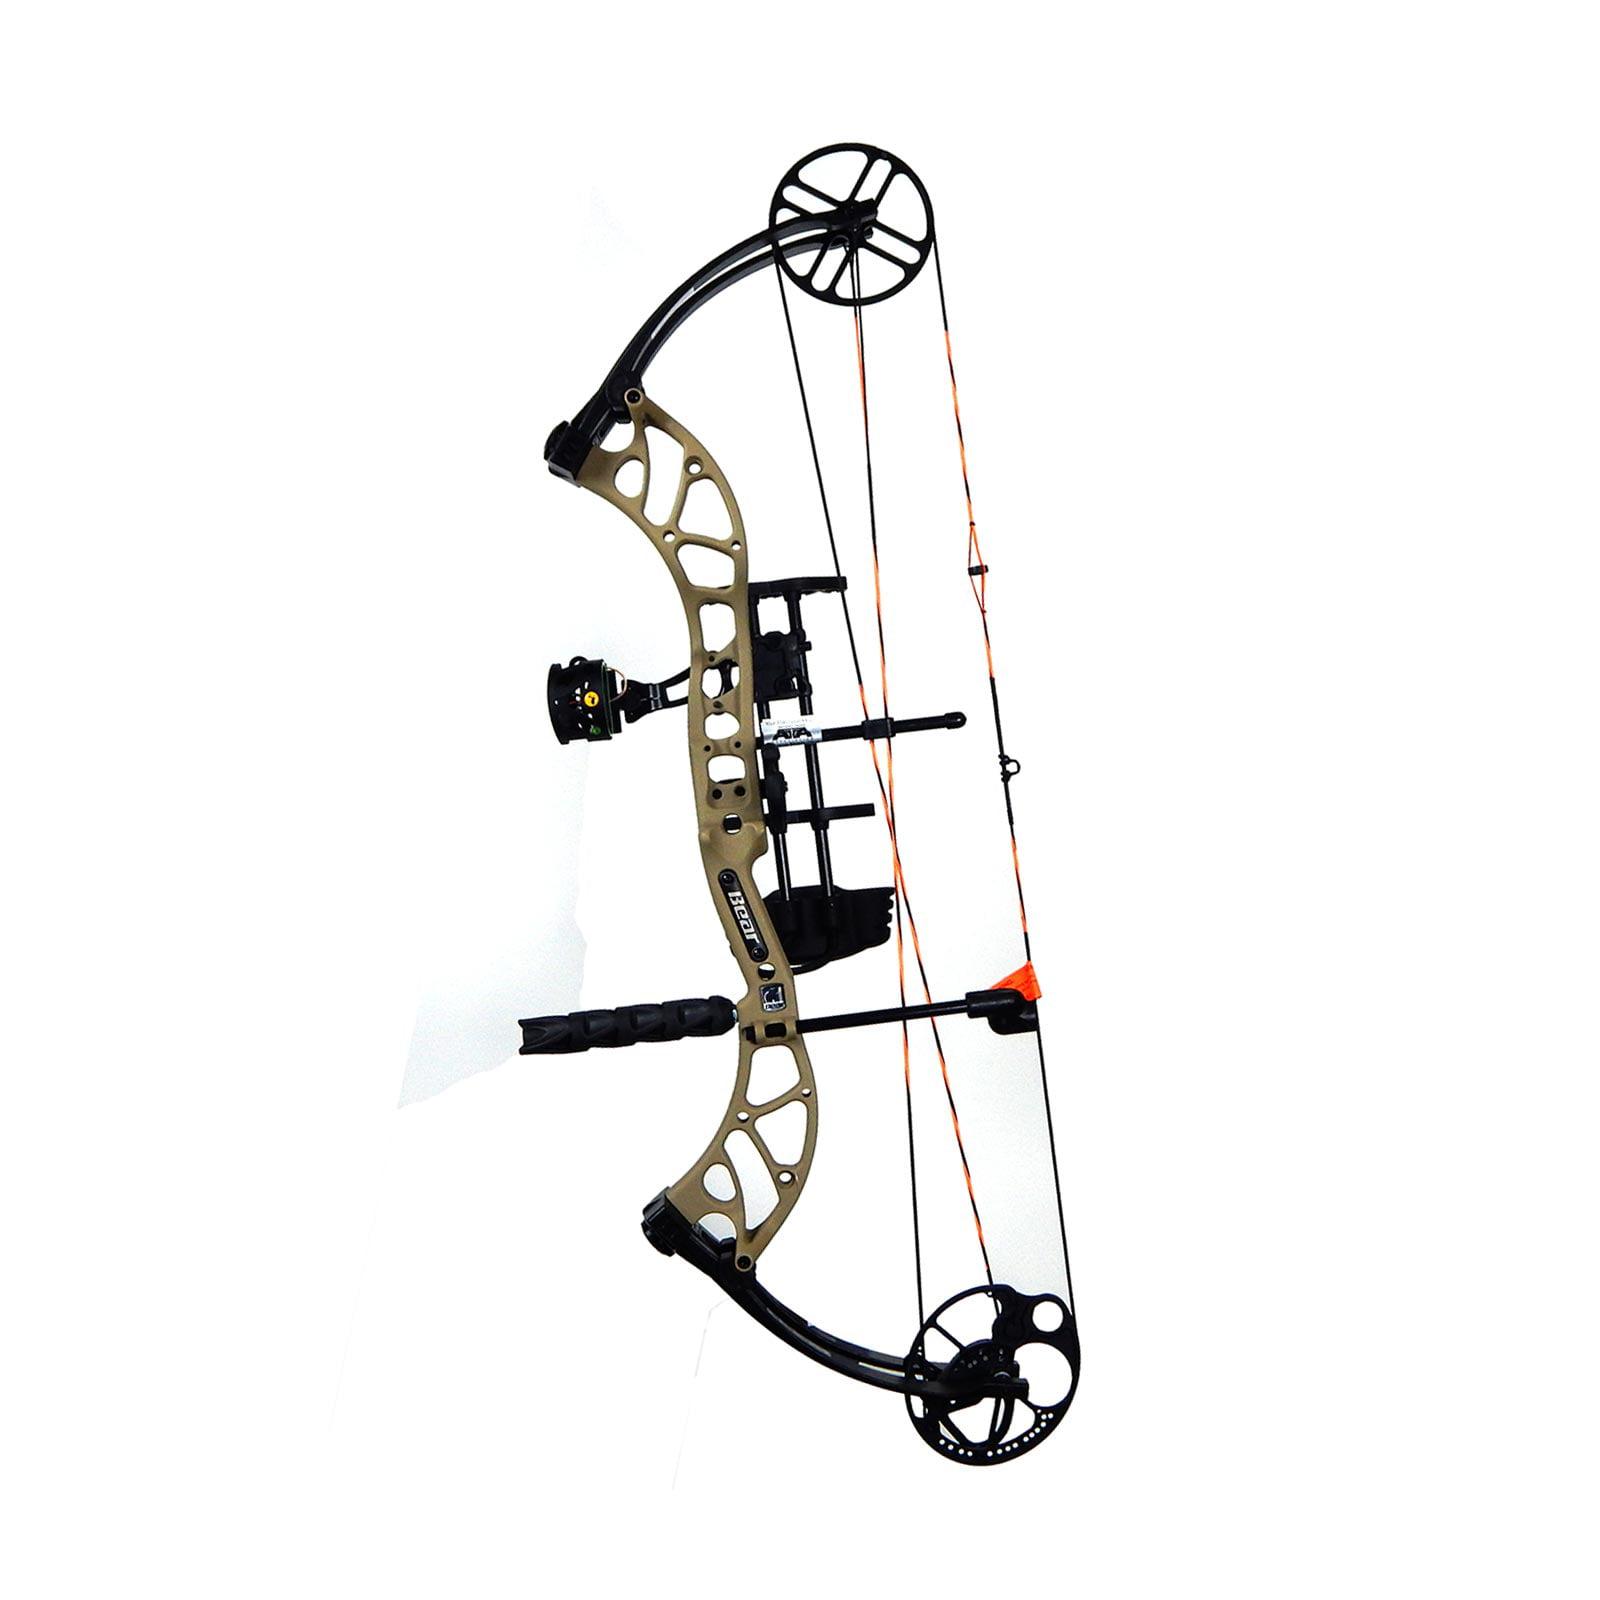 "Bear Archery Wild RTH Compound Bow Package 24-31"" RH 50-60# Sand, A6WD11306R by Bear Archery"